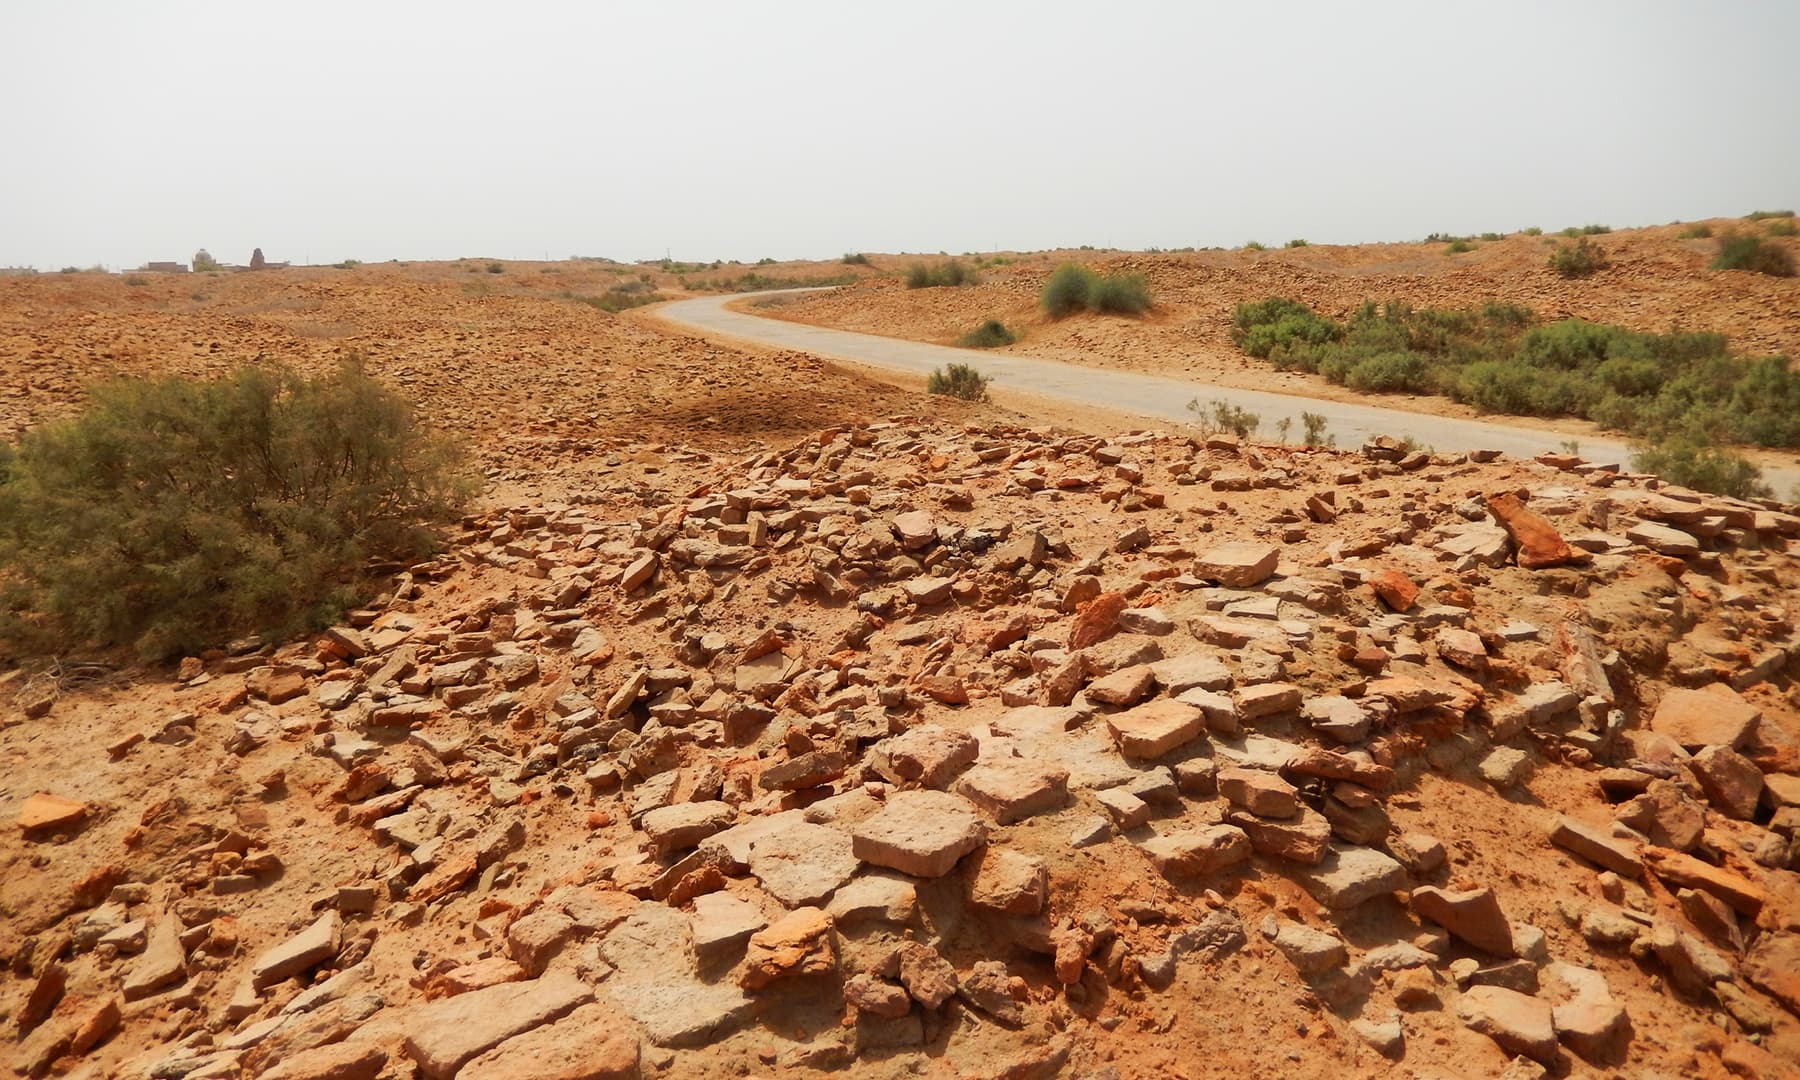 بہمن آباد کے قدیم آثار—تصویر ابوبکر شیخ